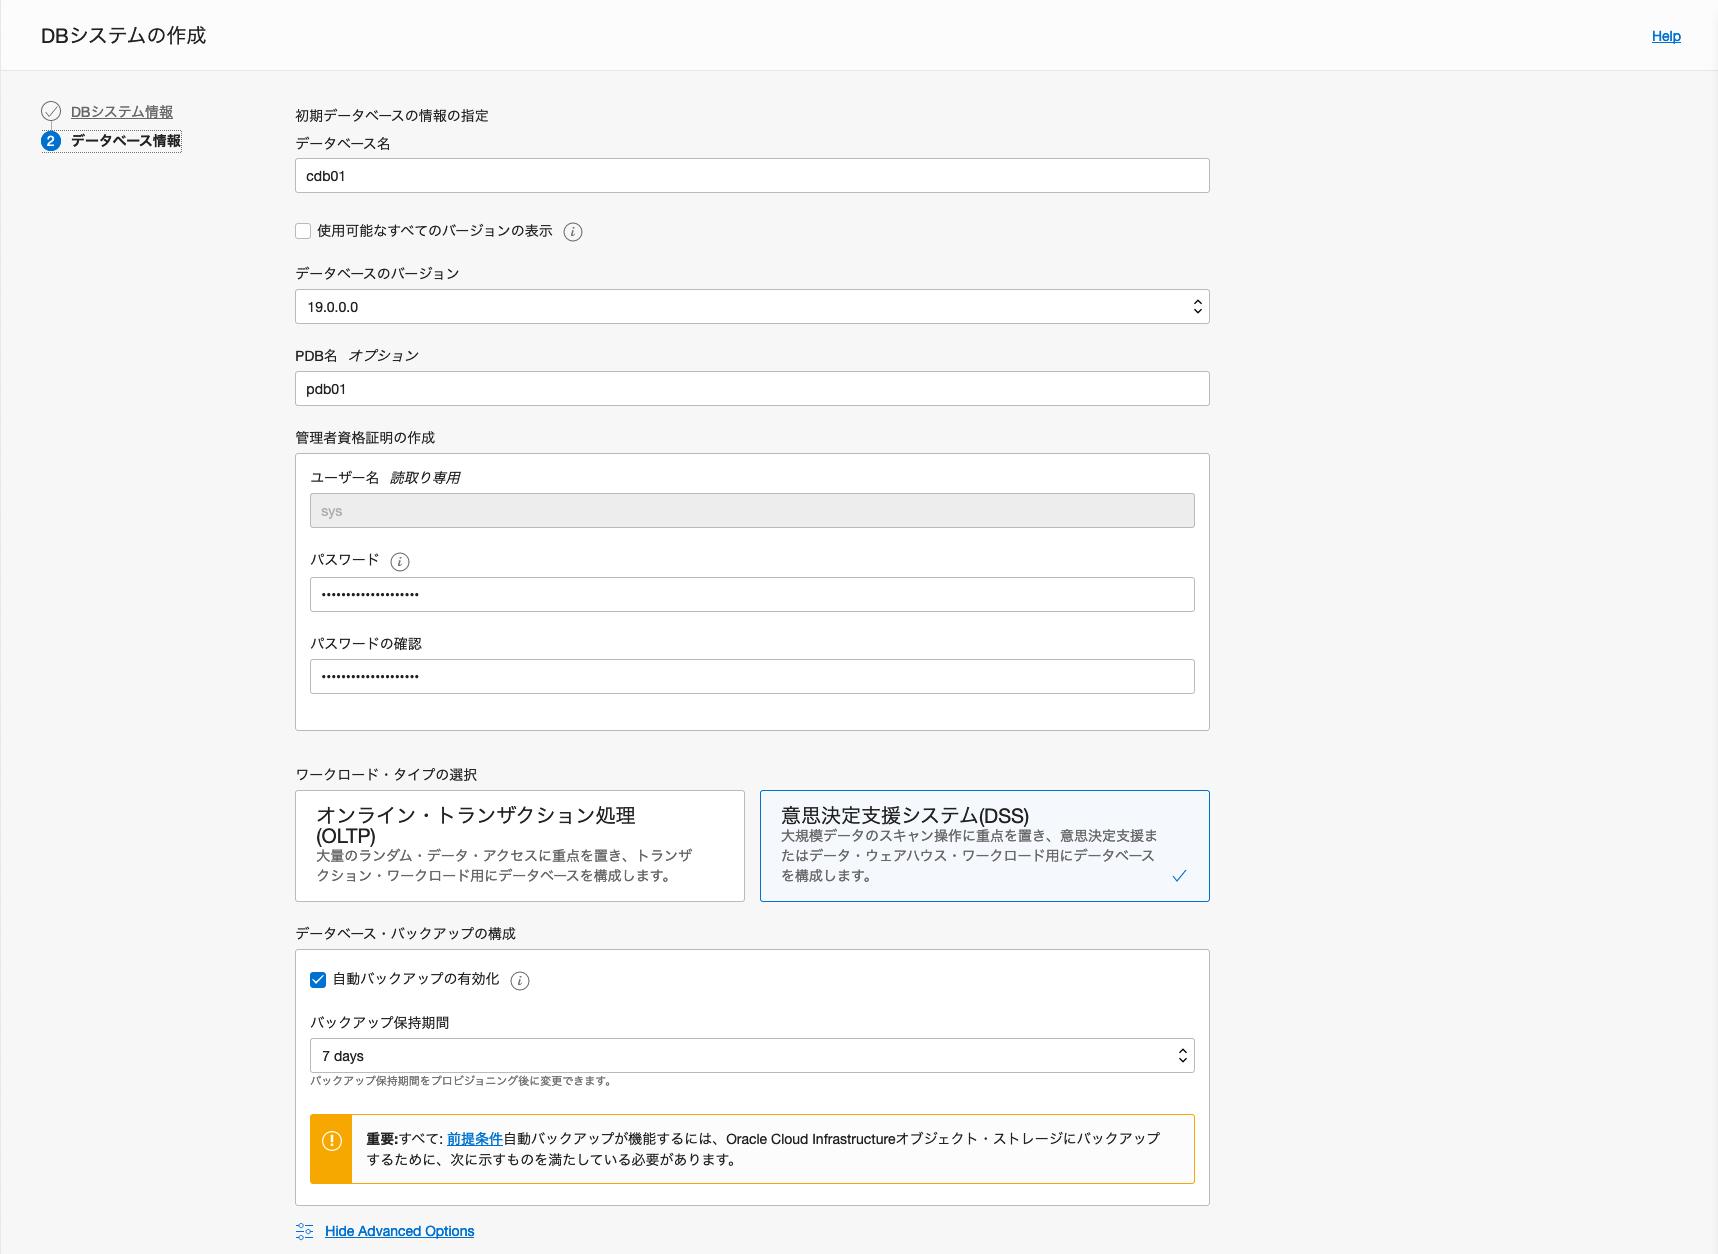 04_RAC作成_DB情報04.png